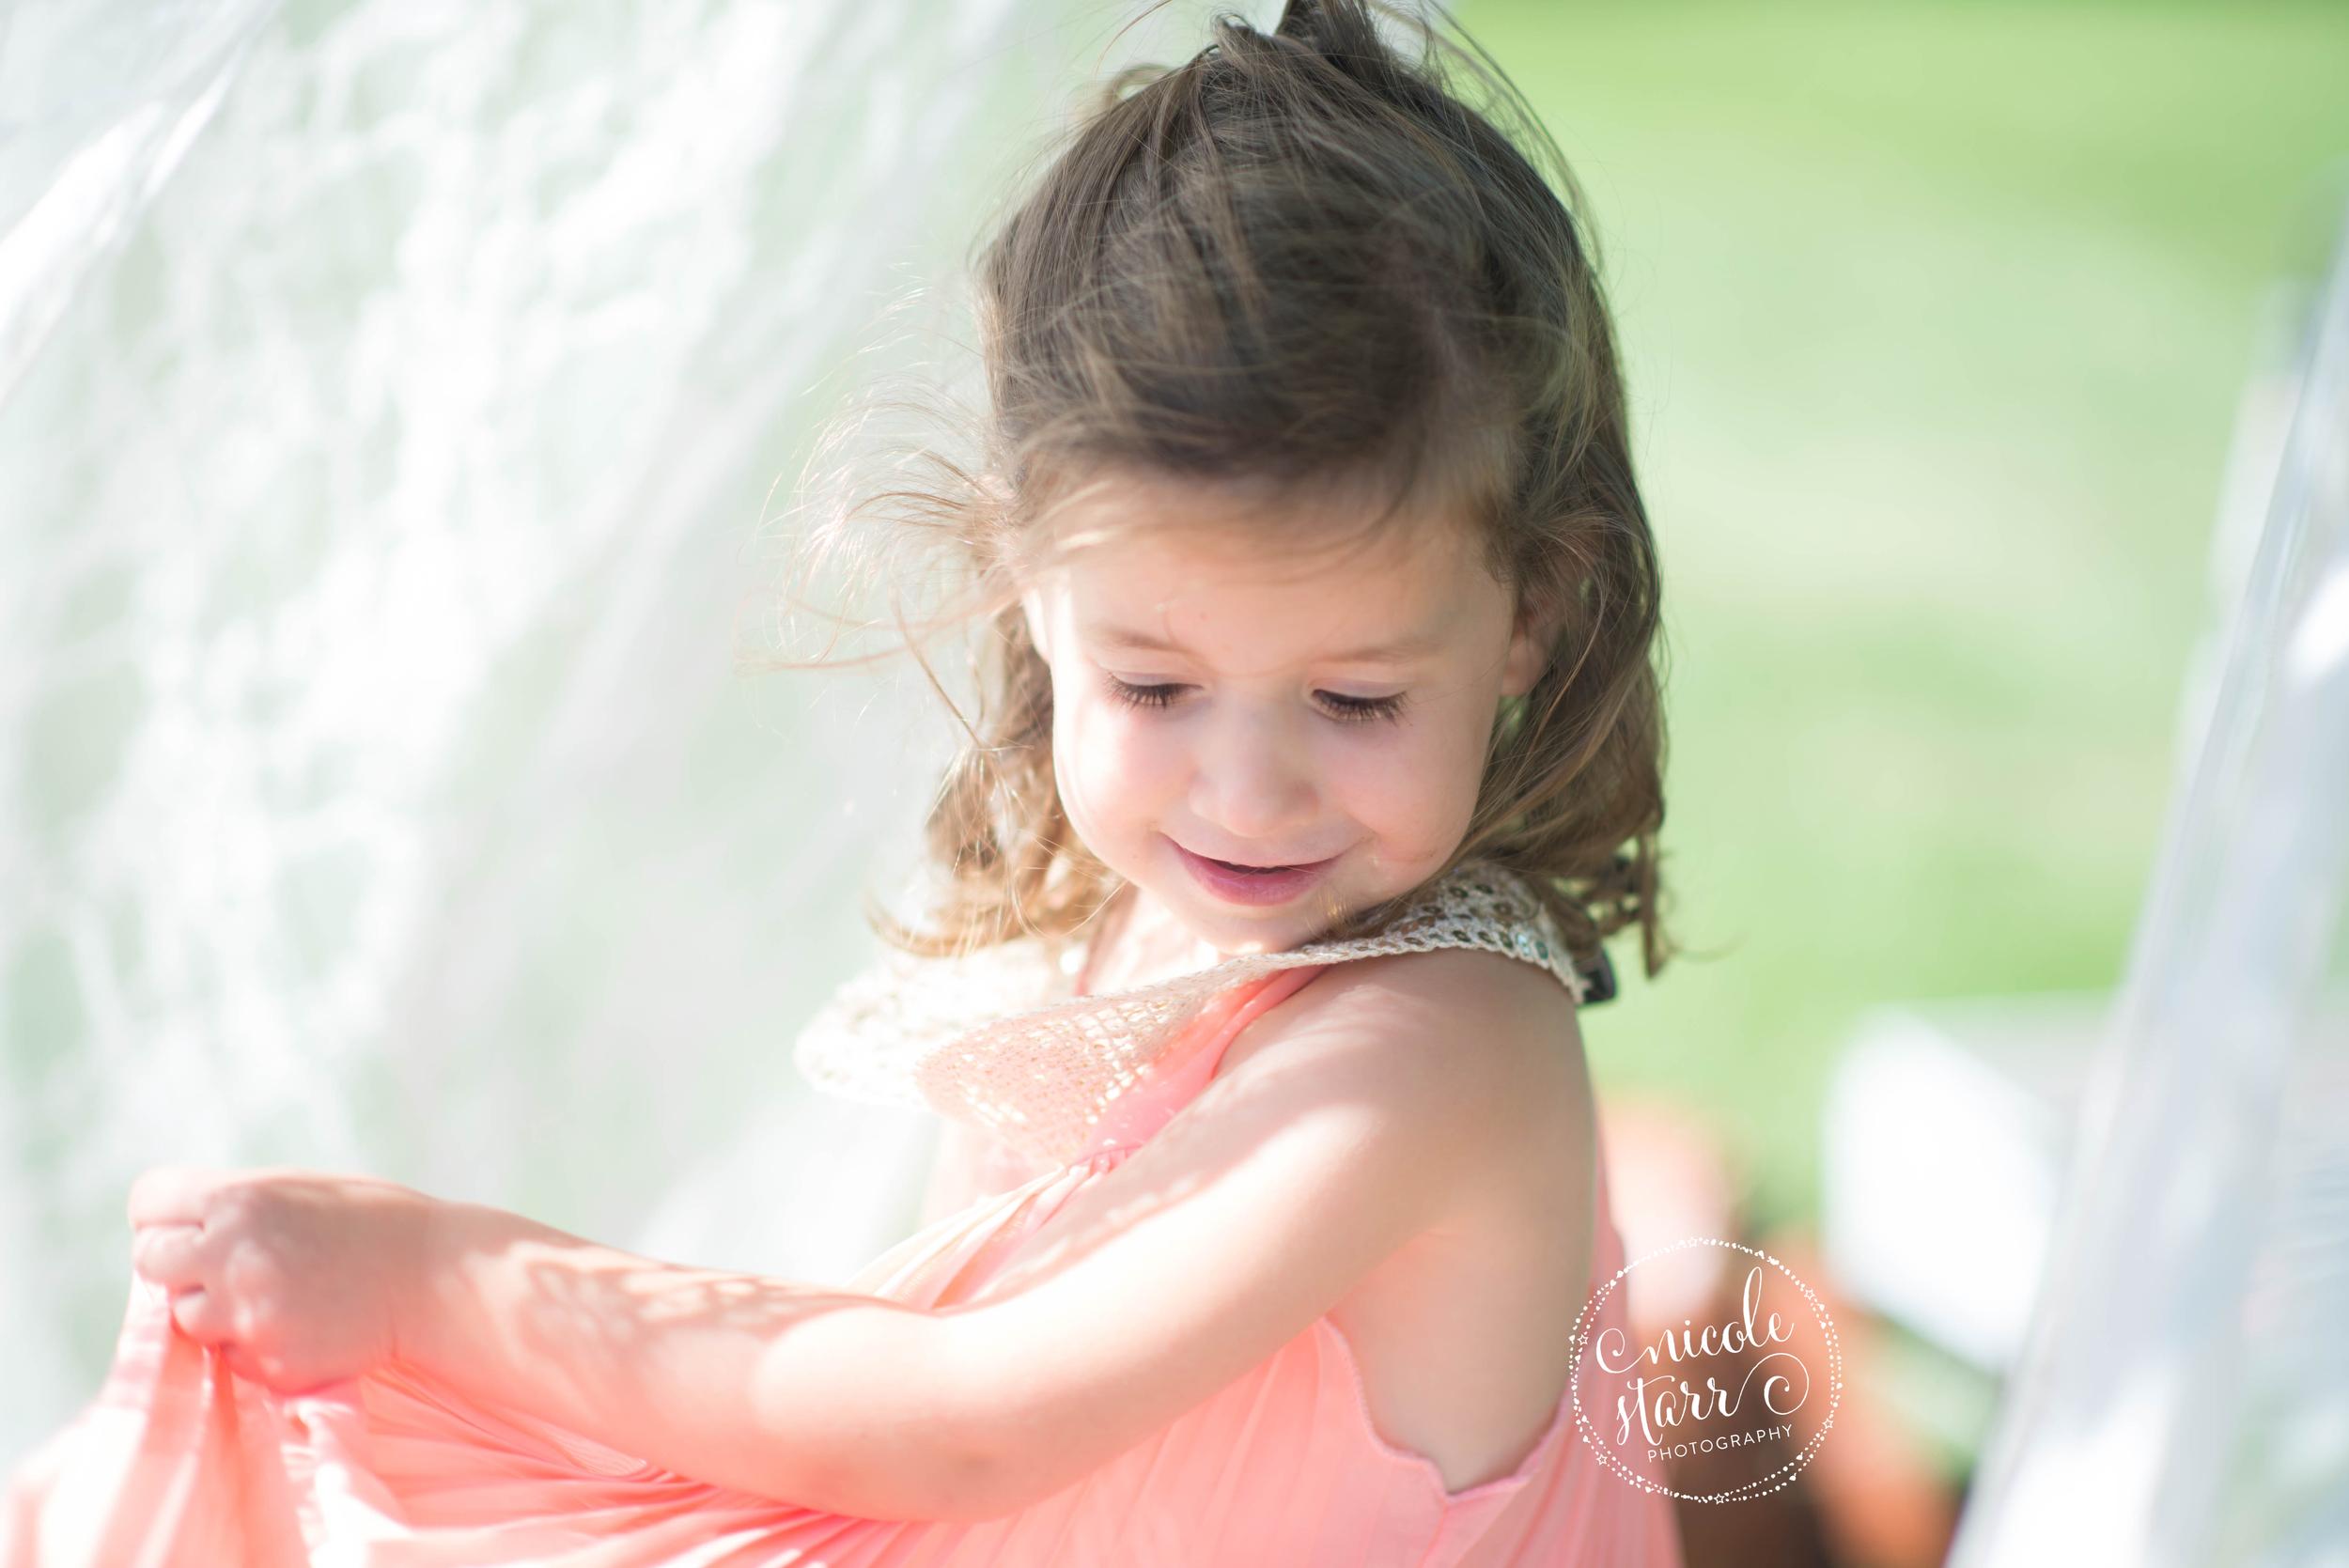 WM-whimsical-child-photography-6.jpg